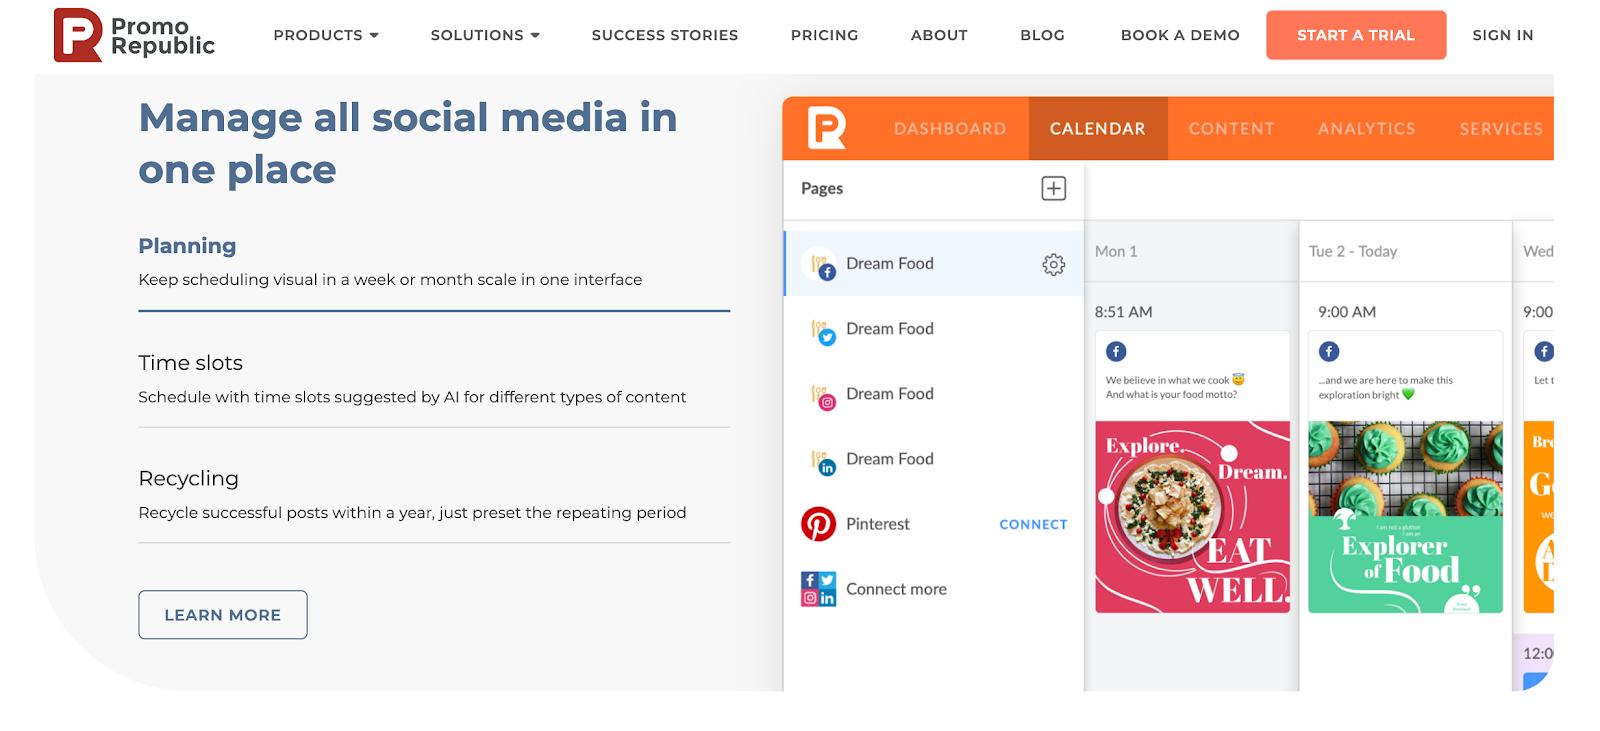 Promo Republic - Social Media Content Management